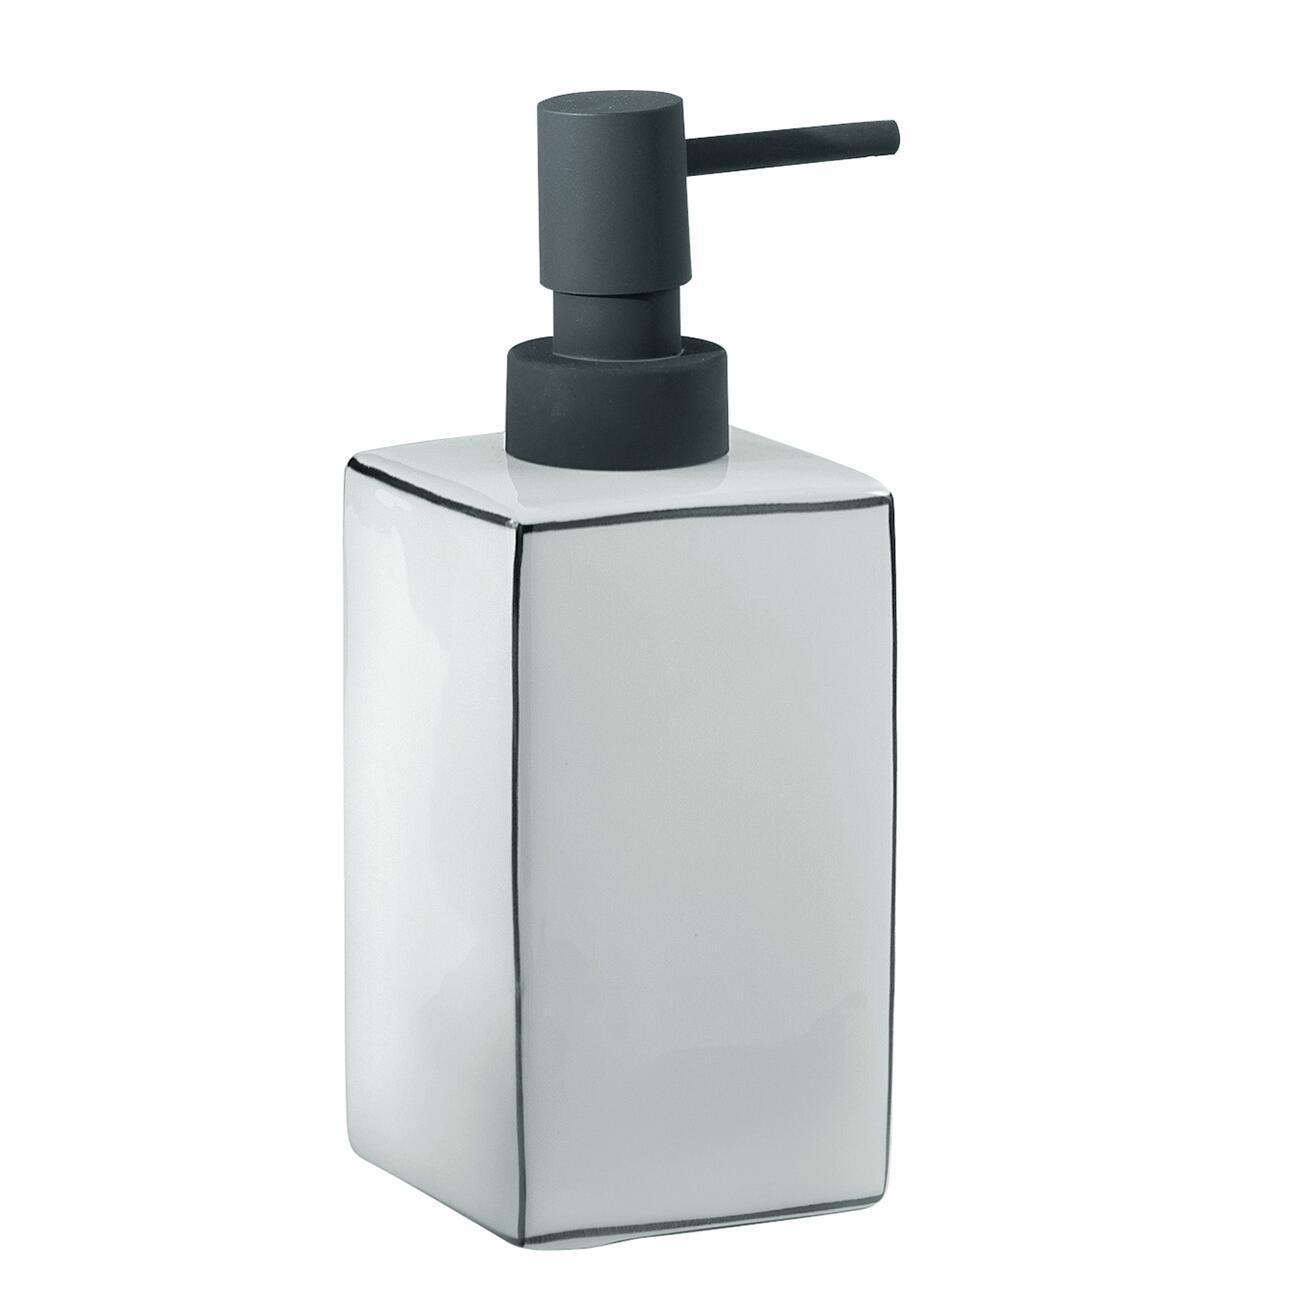 Dispenser sapone Lucrezia bianco - 1